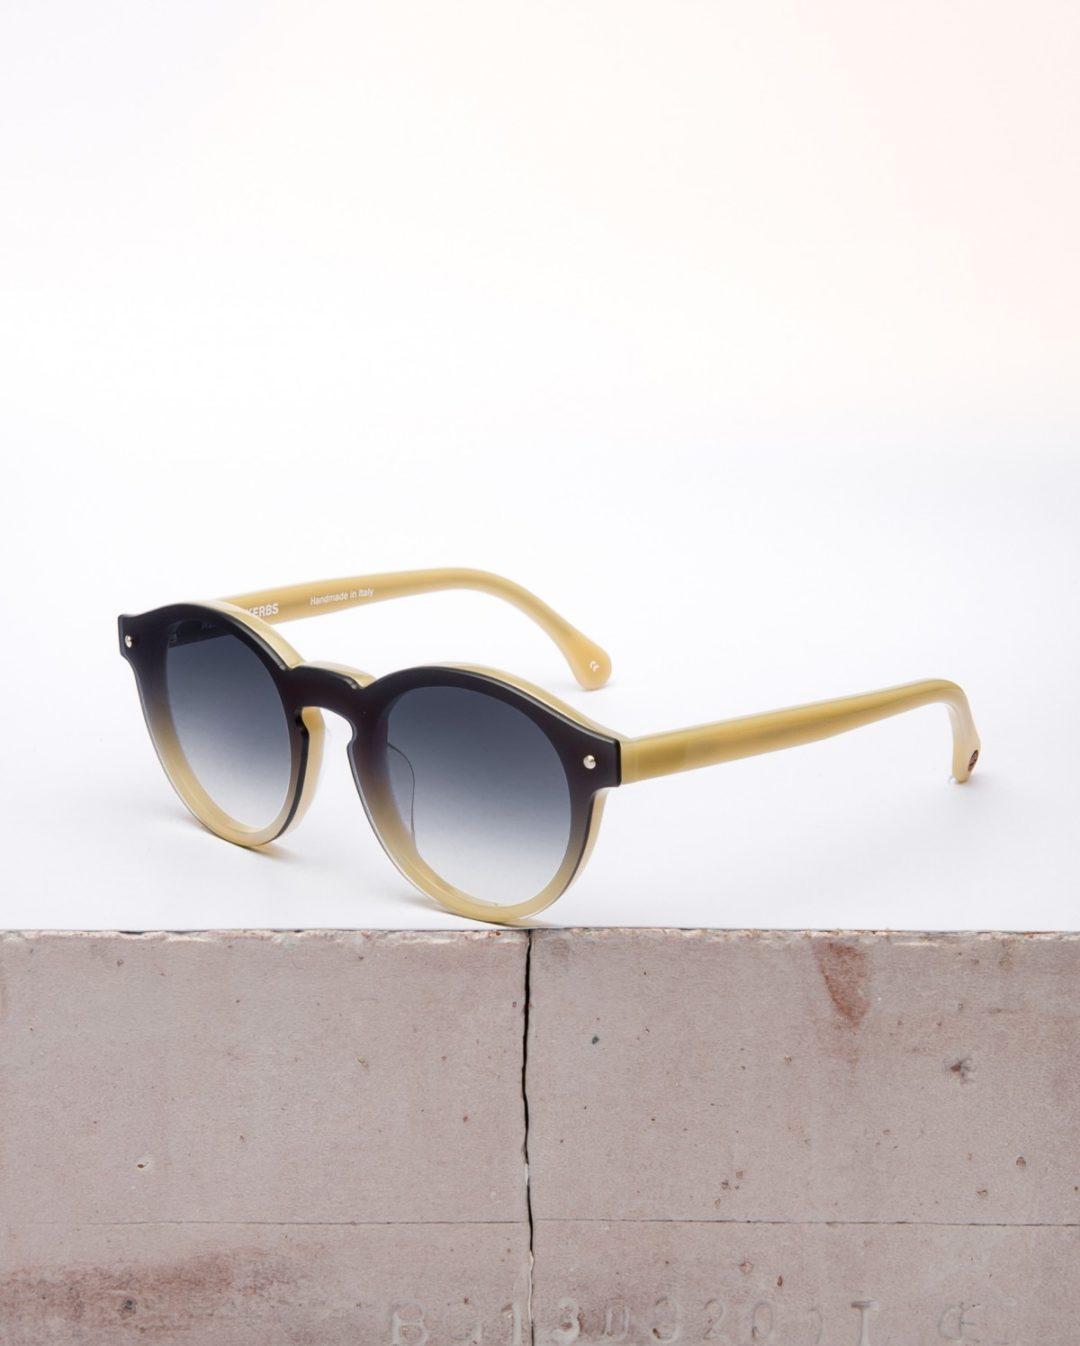 Gafas de sol Travel beige MYBARRIO Alfred Kerbs 2